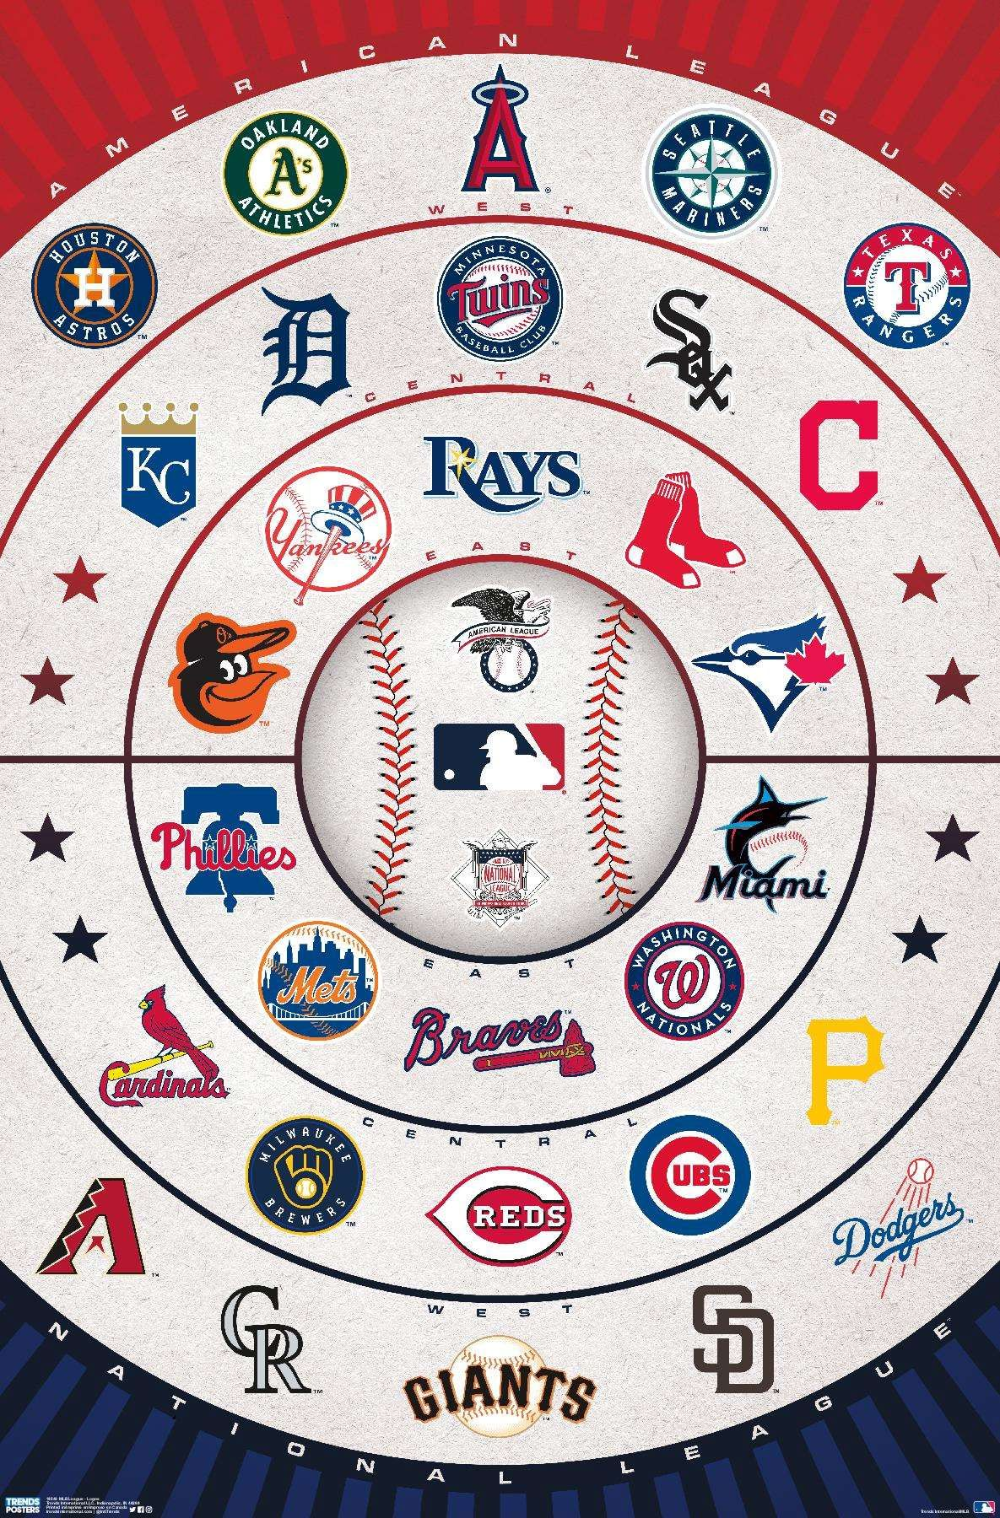 Mlb League Logos 20 In 2020 Mlb League Mlb Chicago Cubs